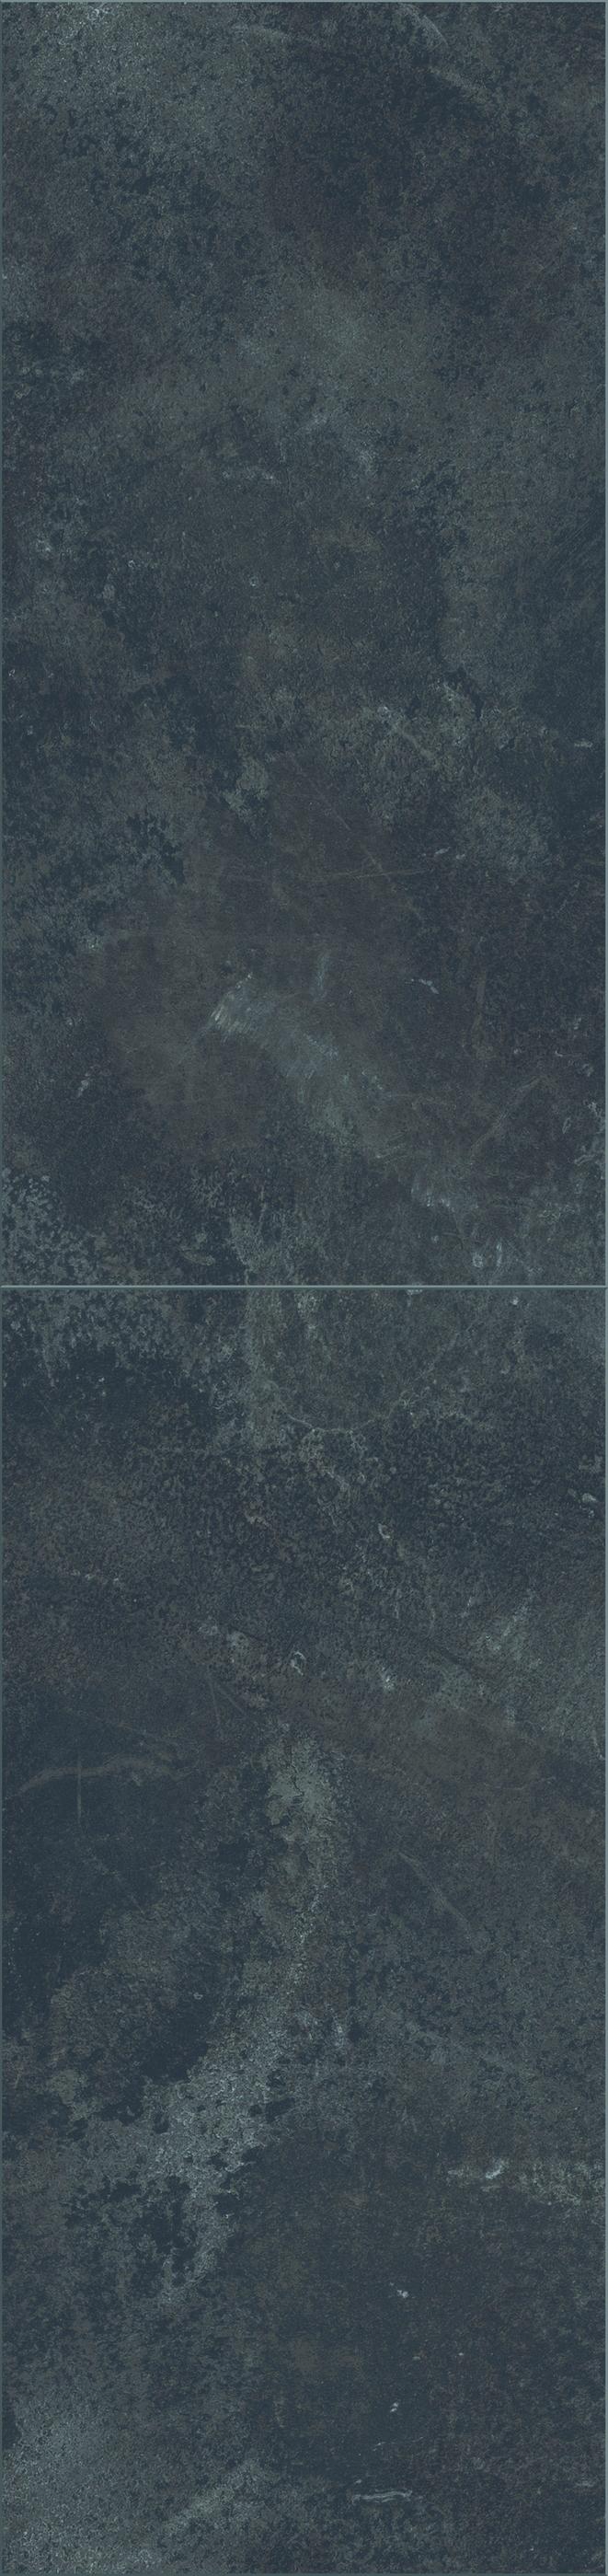 kronotex mega plus laminat himalaya d 3079 von kronotex. Black Bedroom Furniture Sets. Home Design Ideas